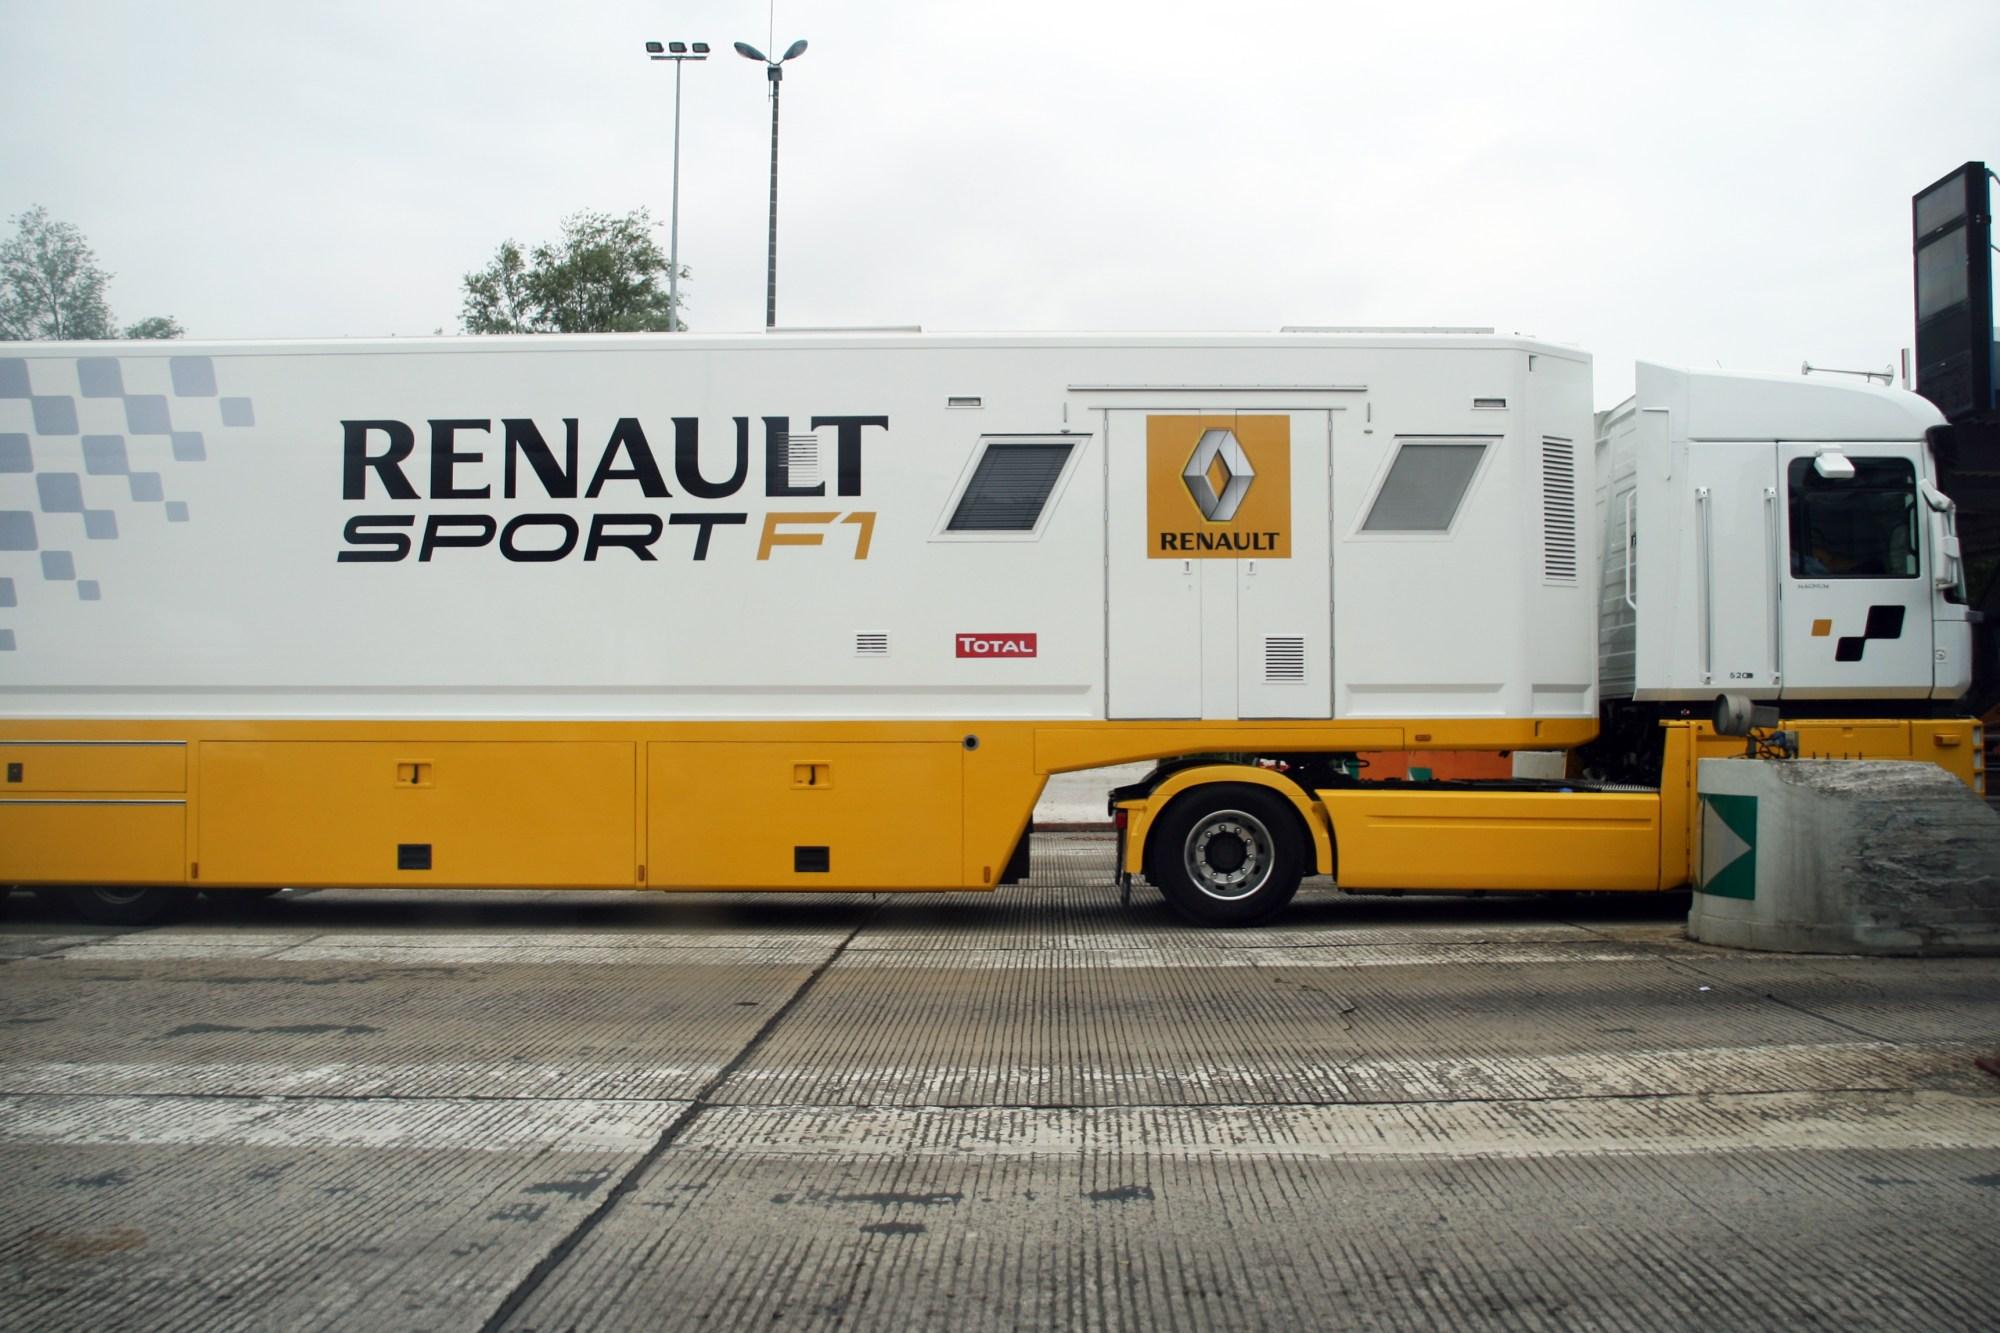 hight resolution of file renault sport f1 truck jpg